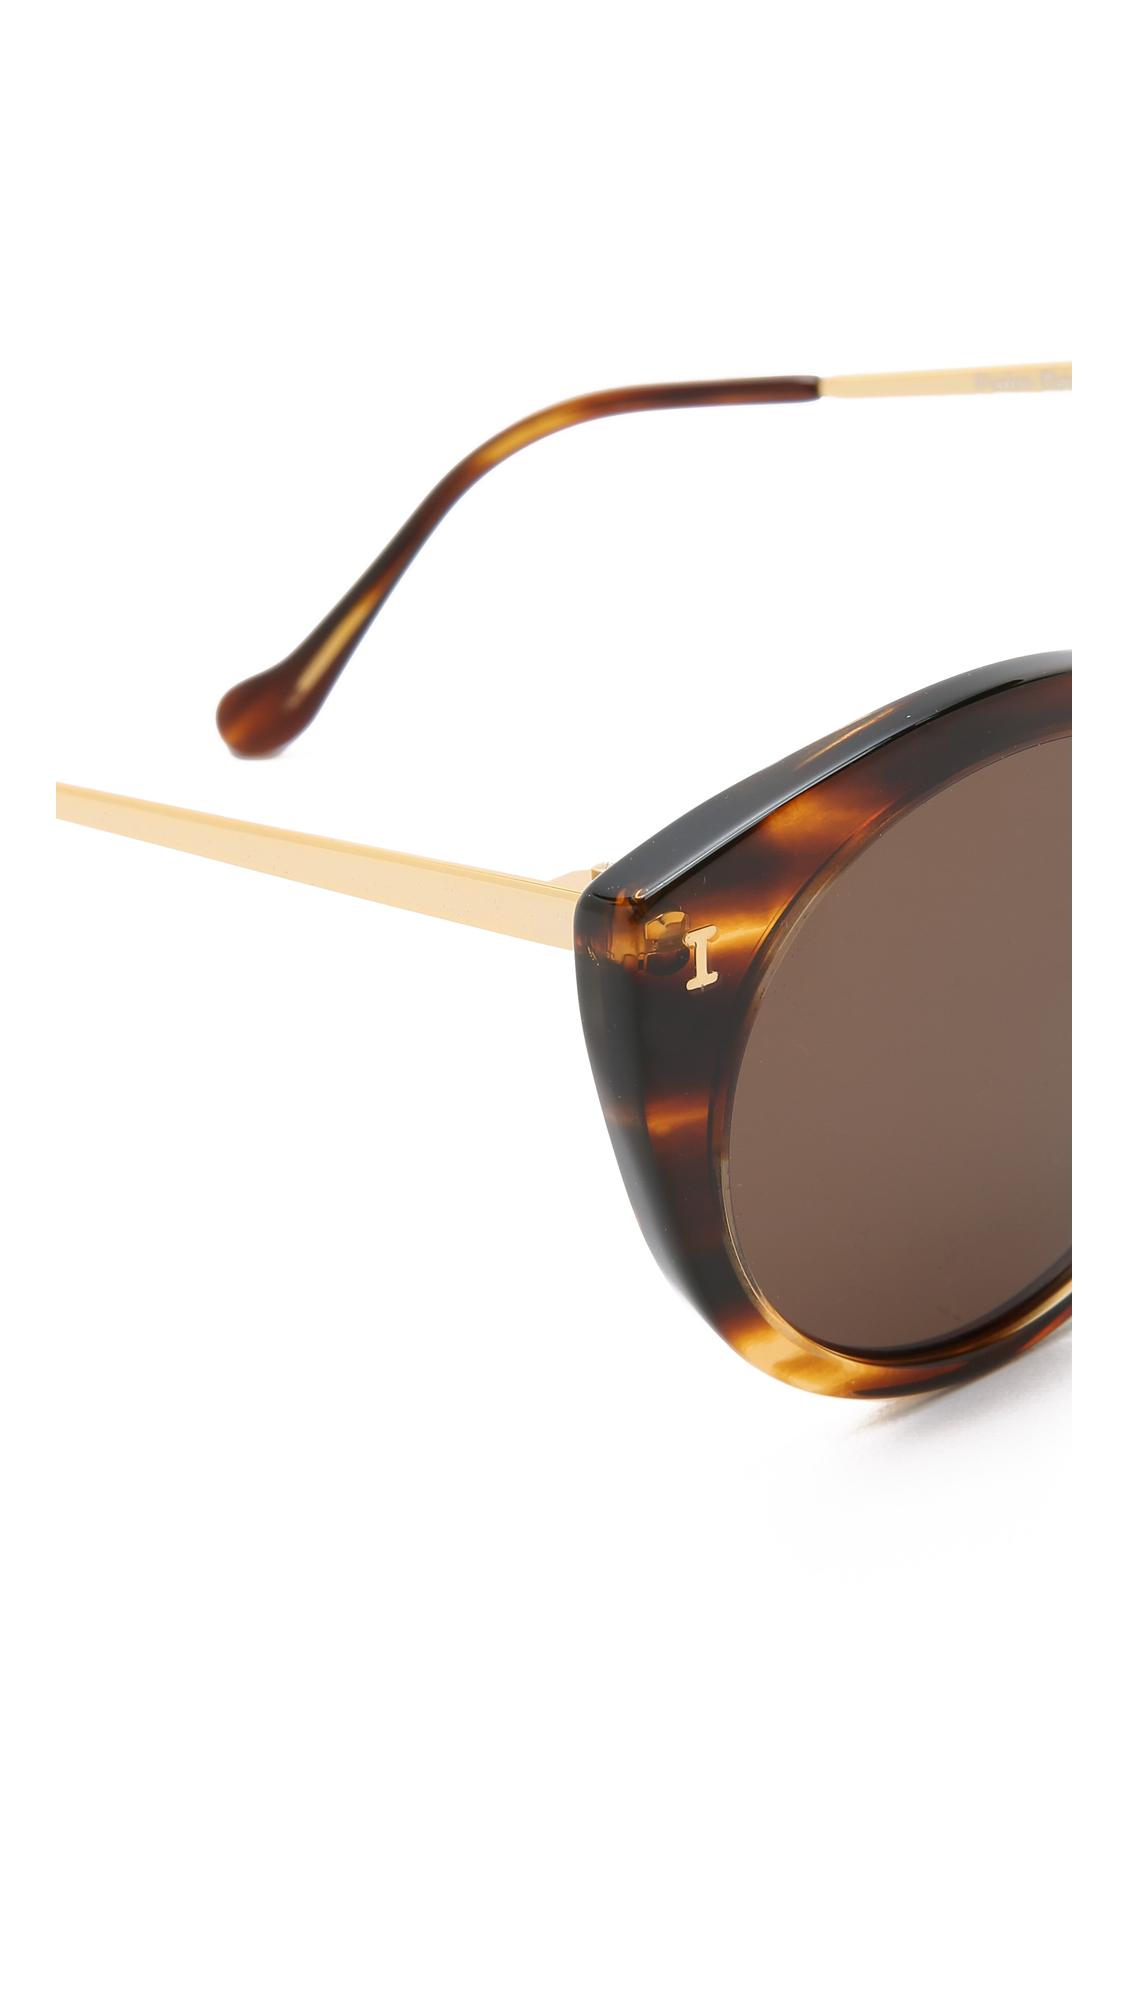 d82cb02a4f Lyst - Illesteva Palm Beach Sunglasses - Sand black in Brown